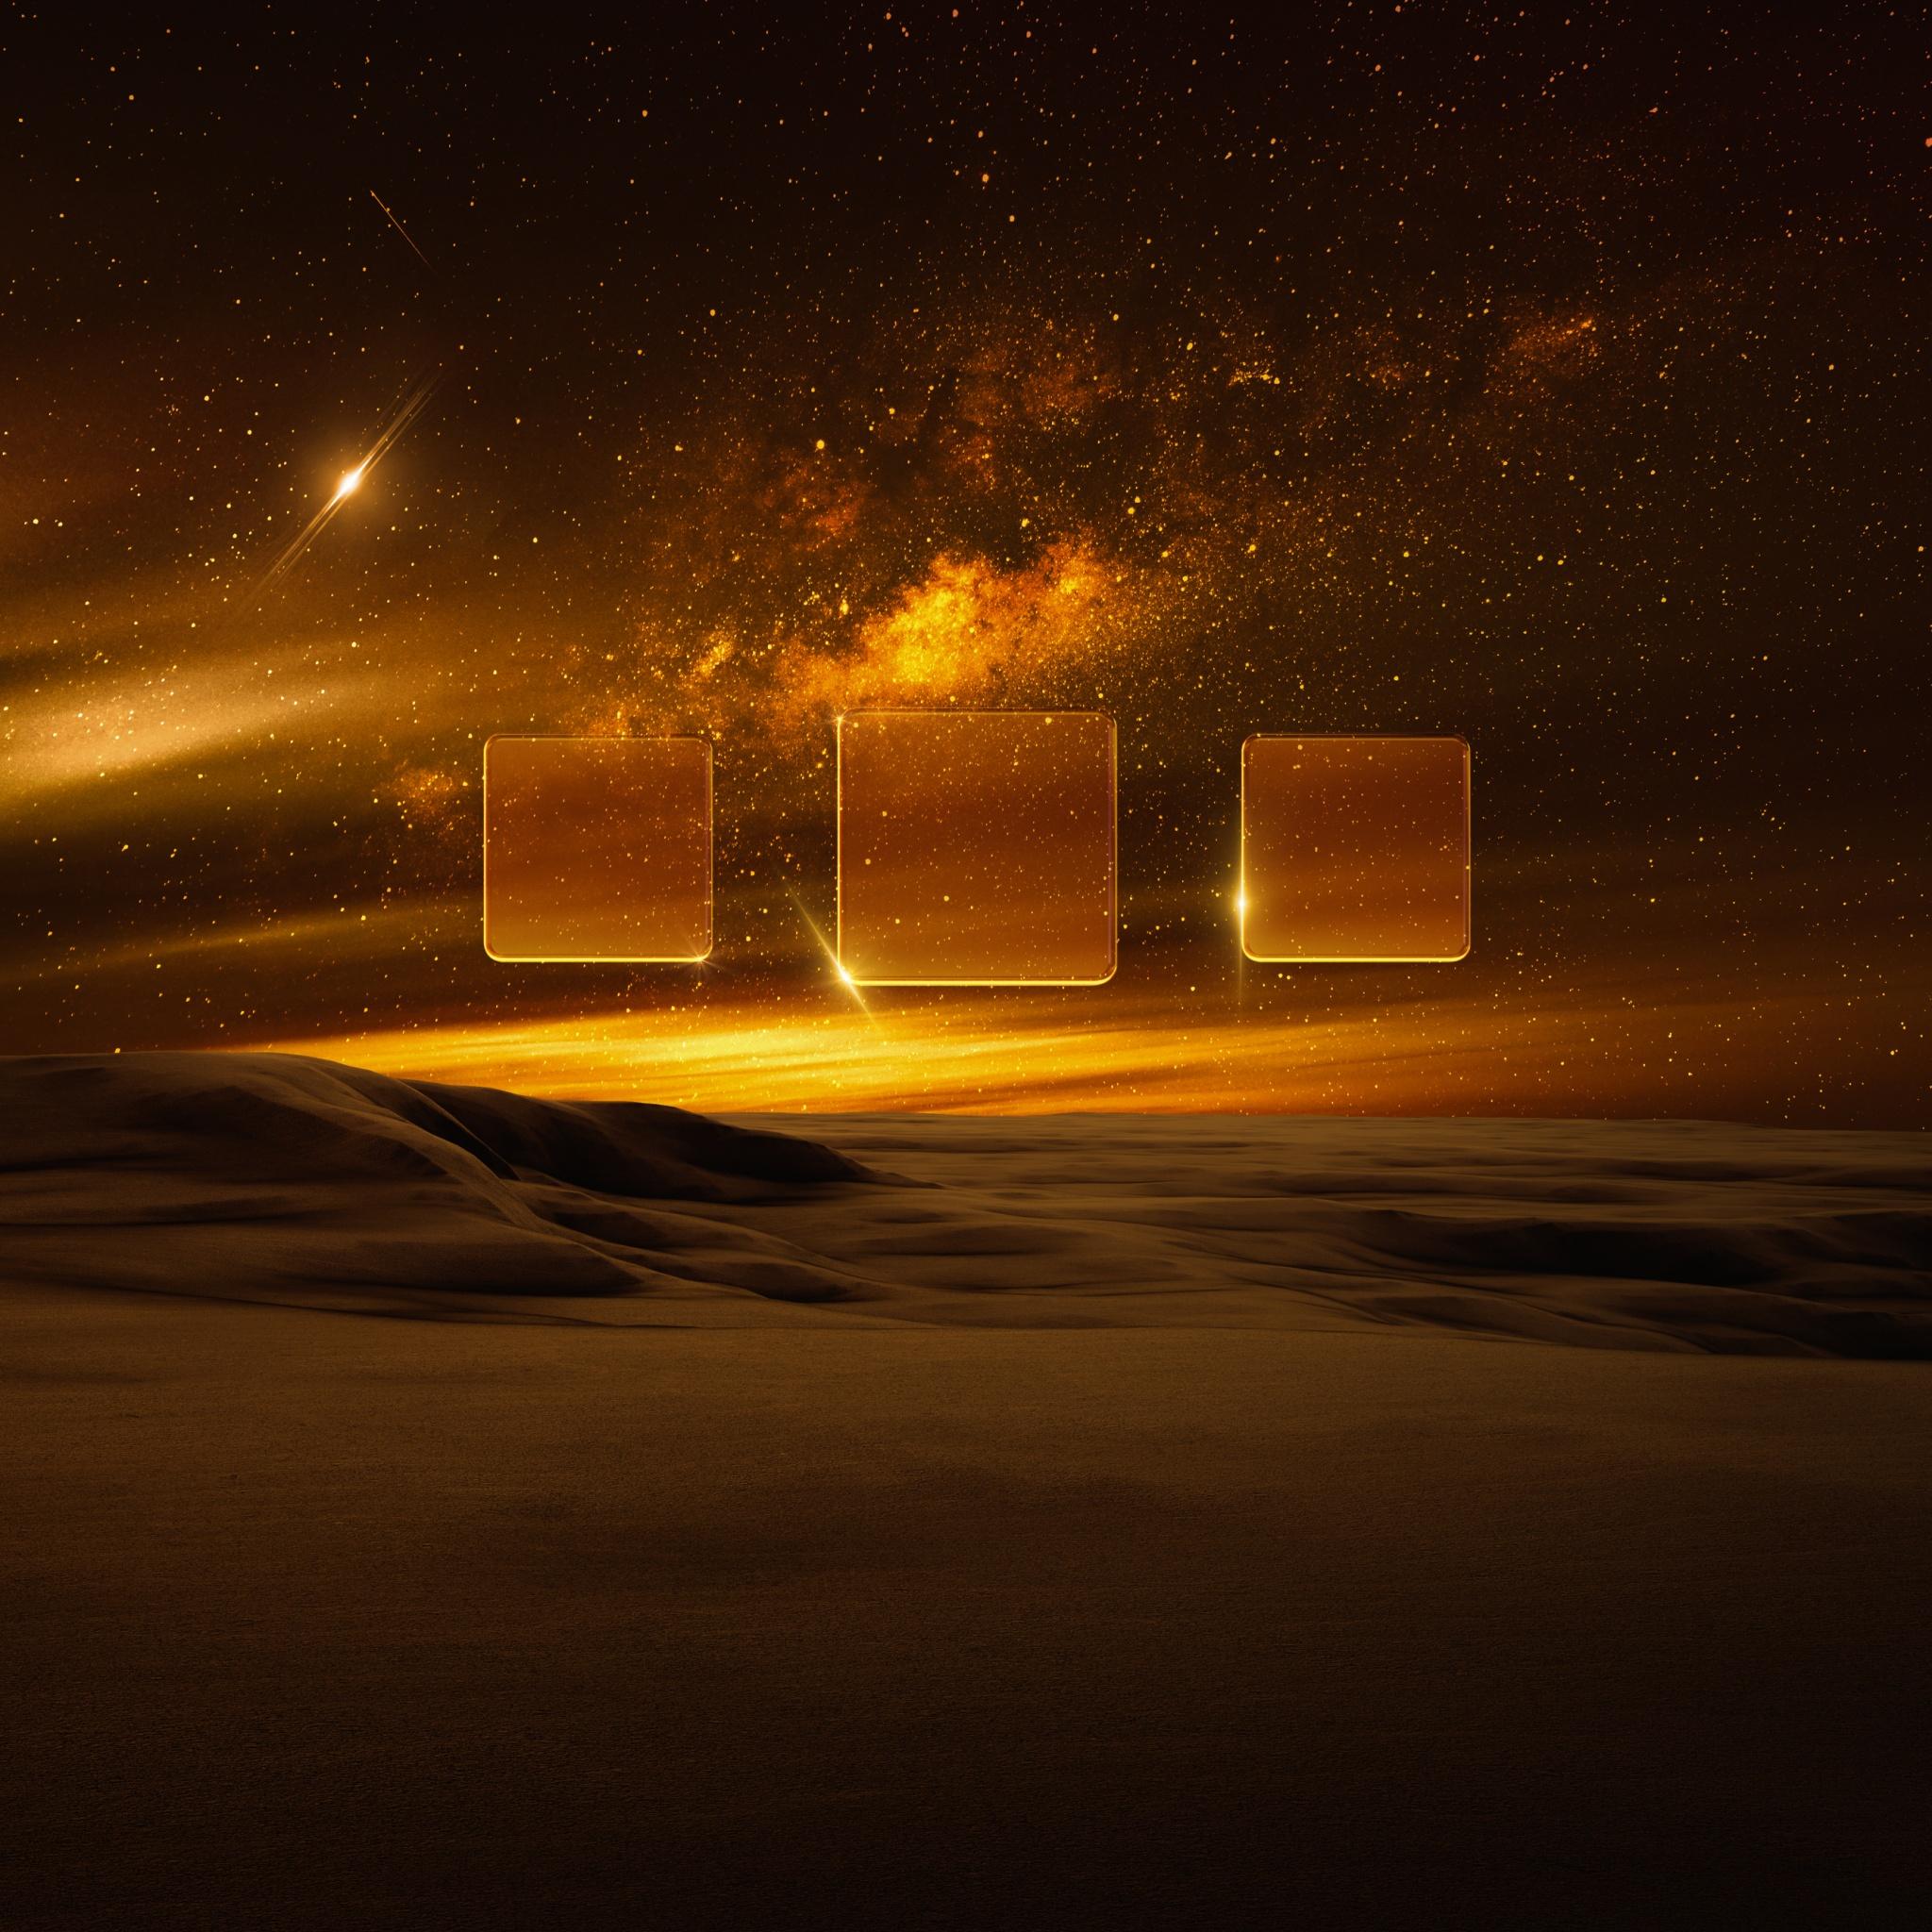 4K Wallpaper Desert, Nebula, Milky Way, Starry Sky